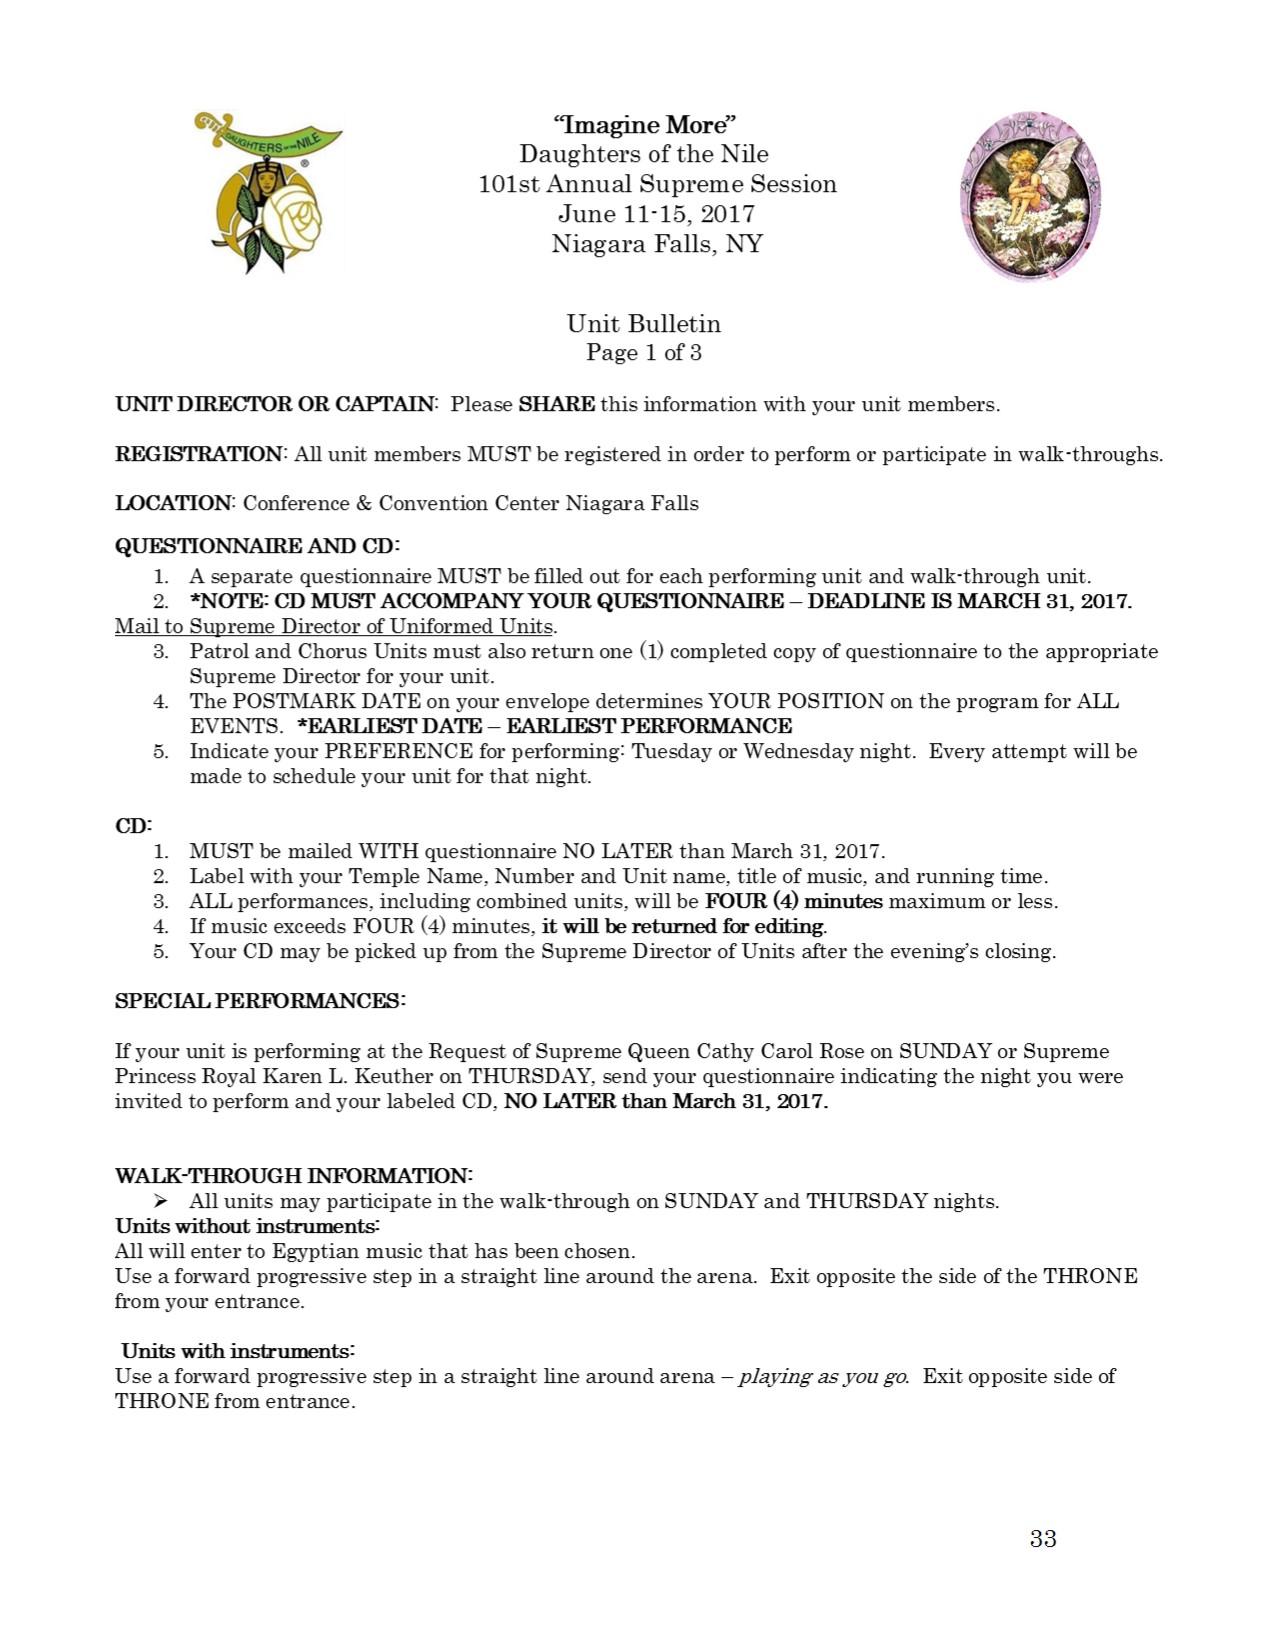 33 Unit Bulletin